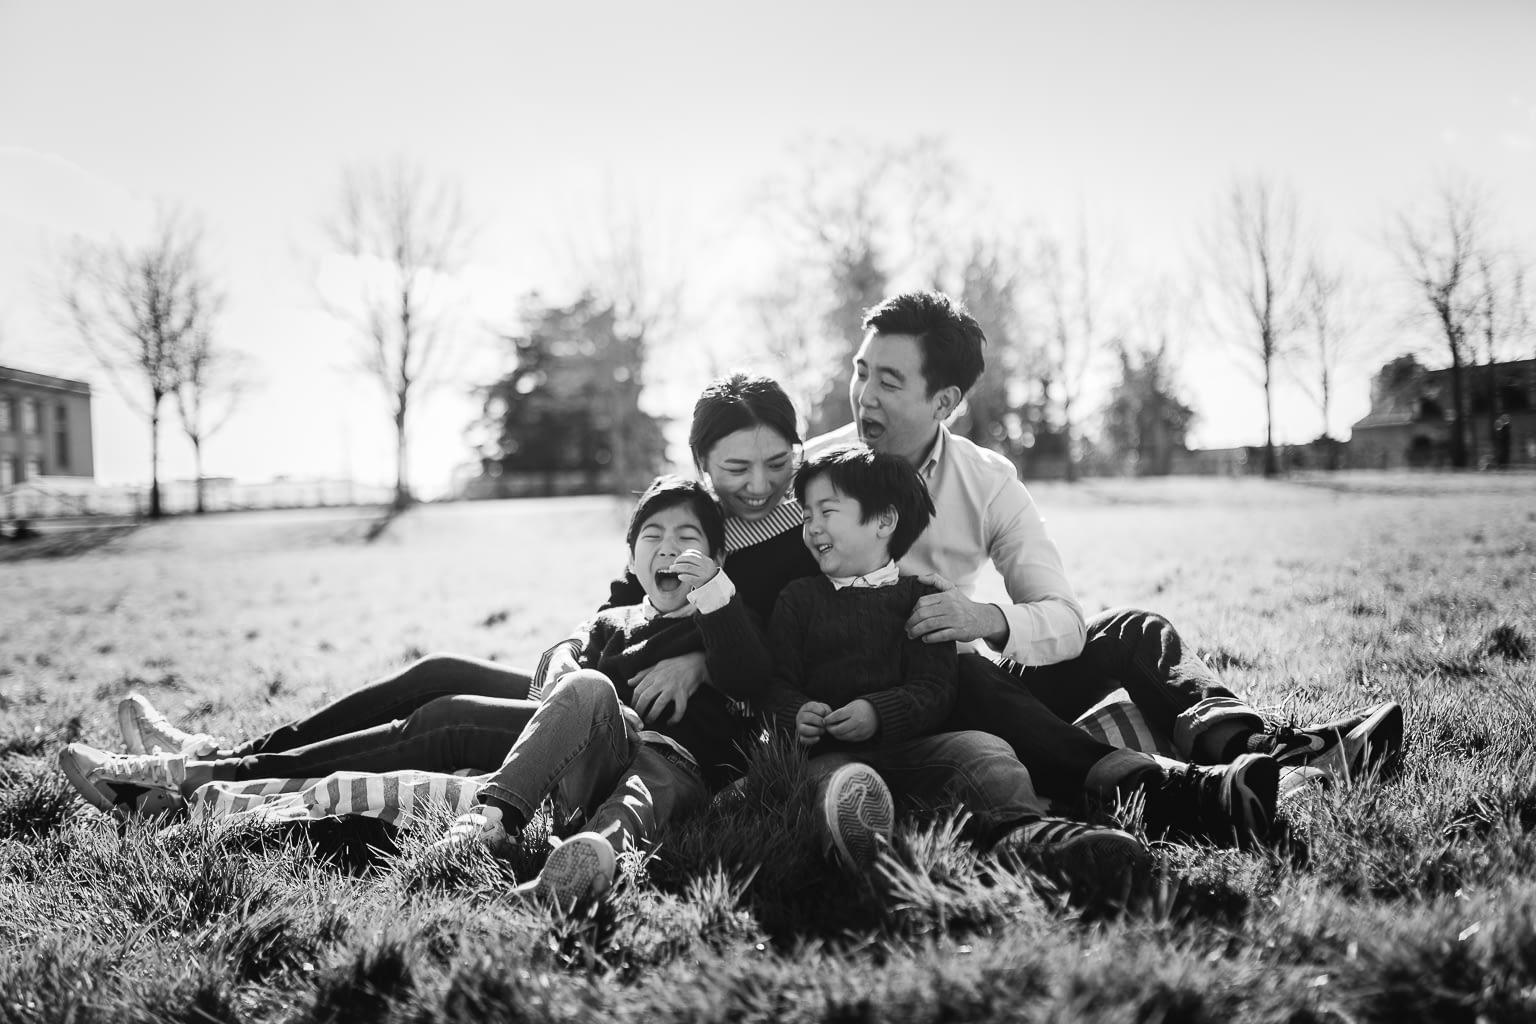 photographe-portrait-lifestyle-rennes-cristina-ramos-5